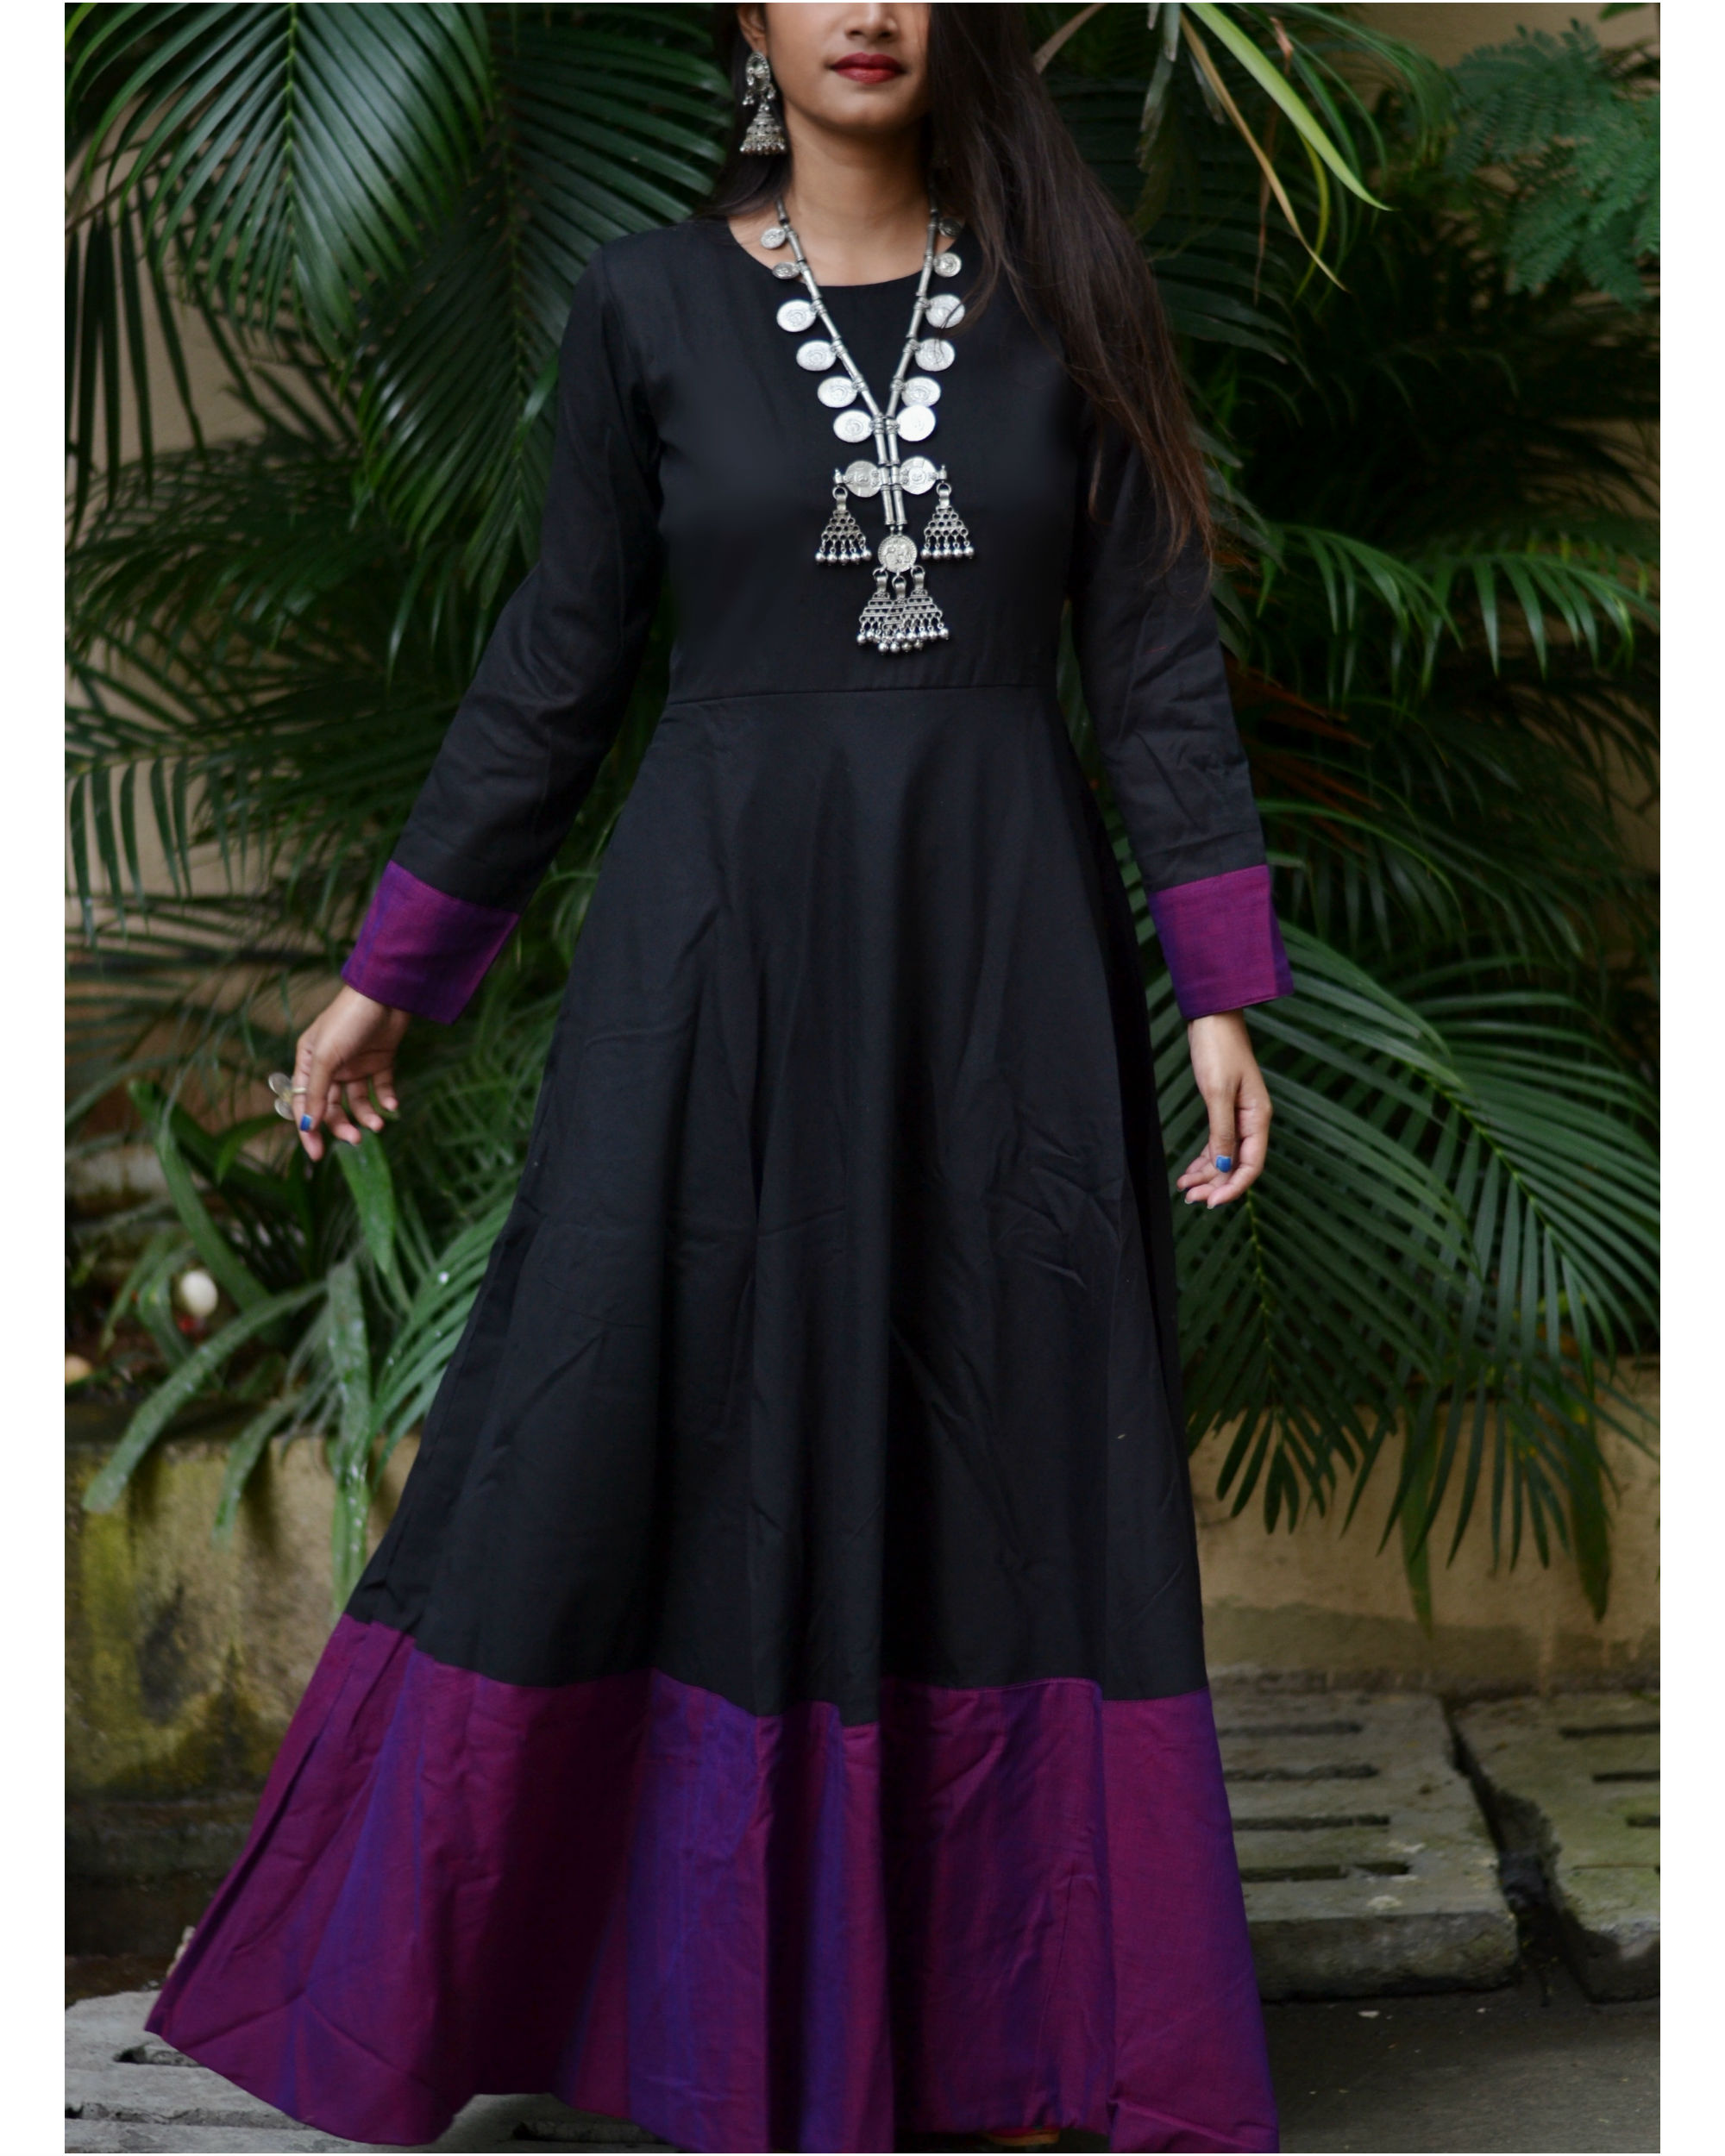 Black purple border dress